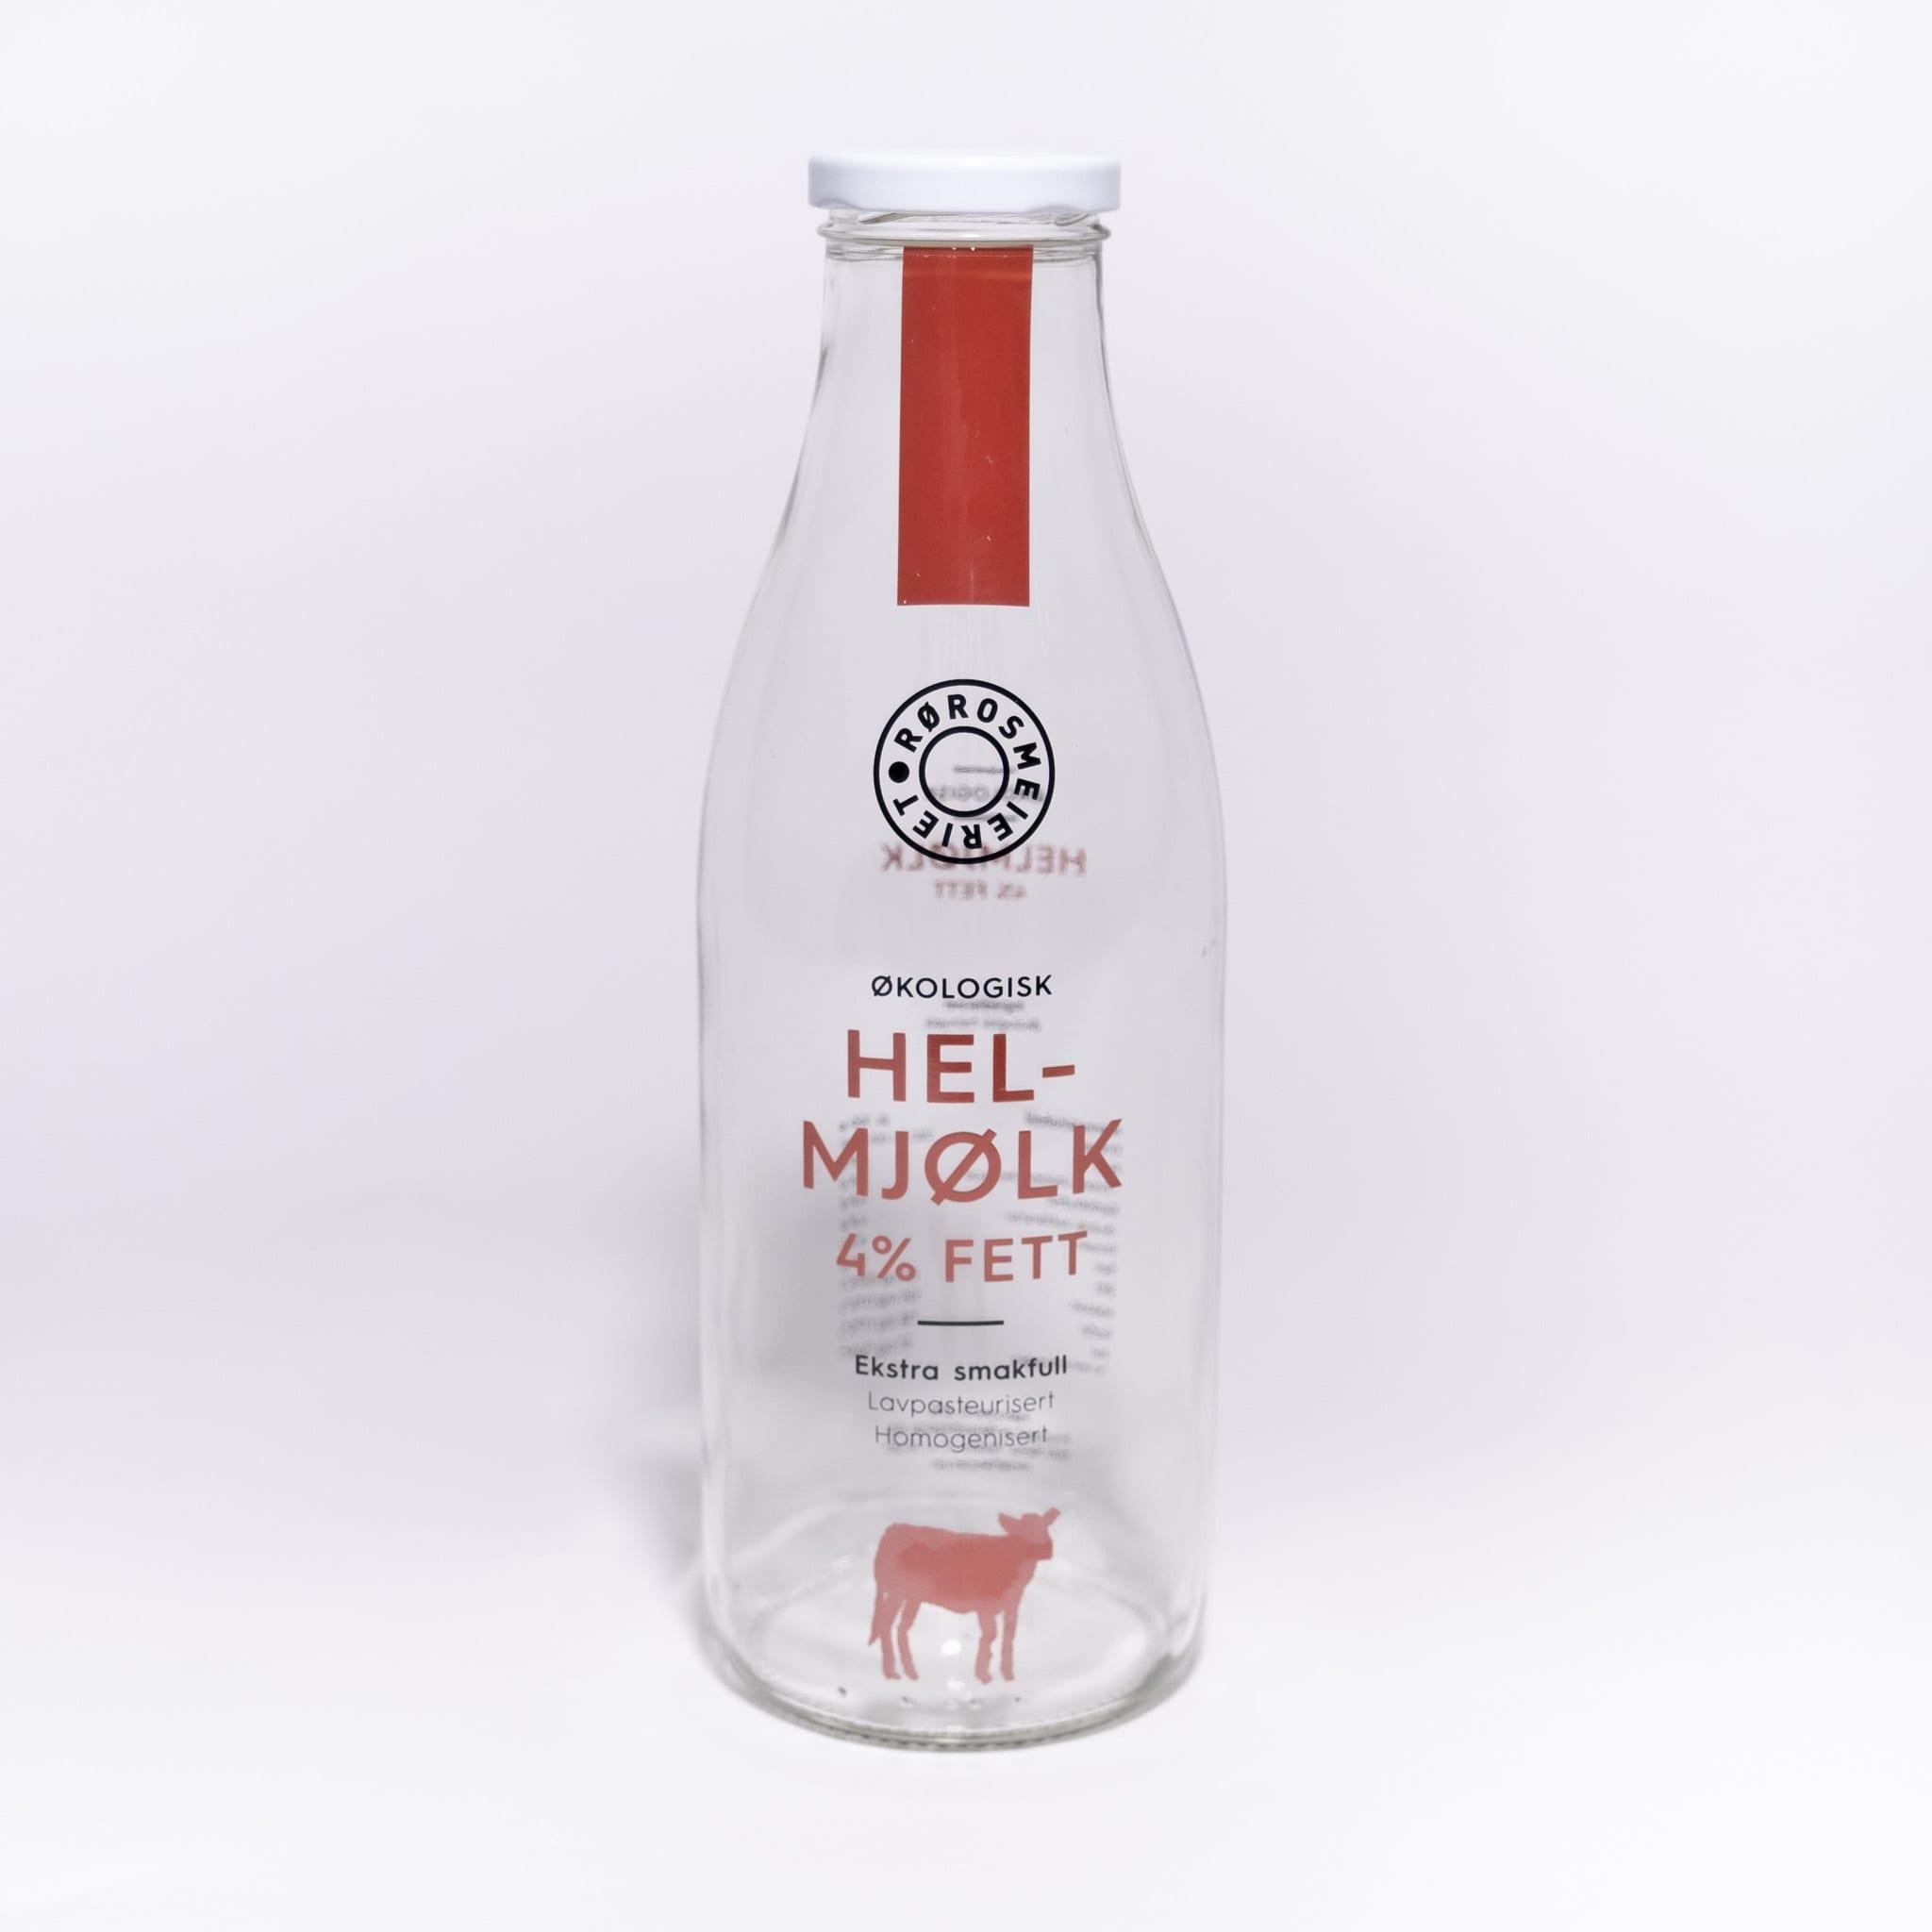 Glassflaske Helmjølk